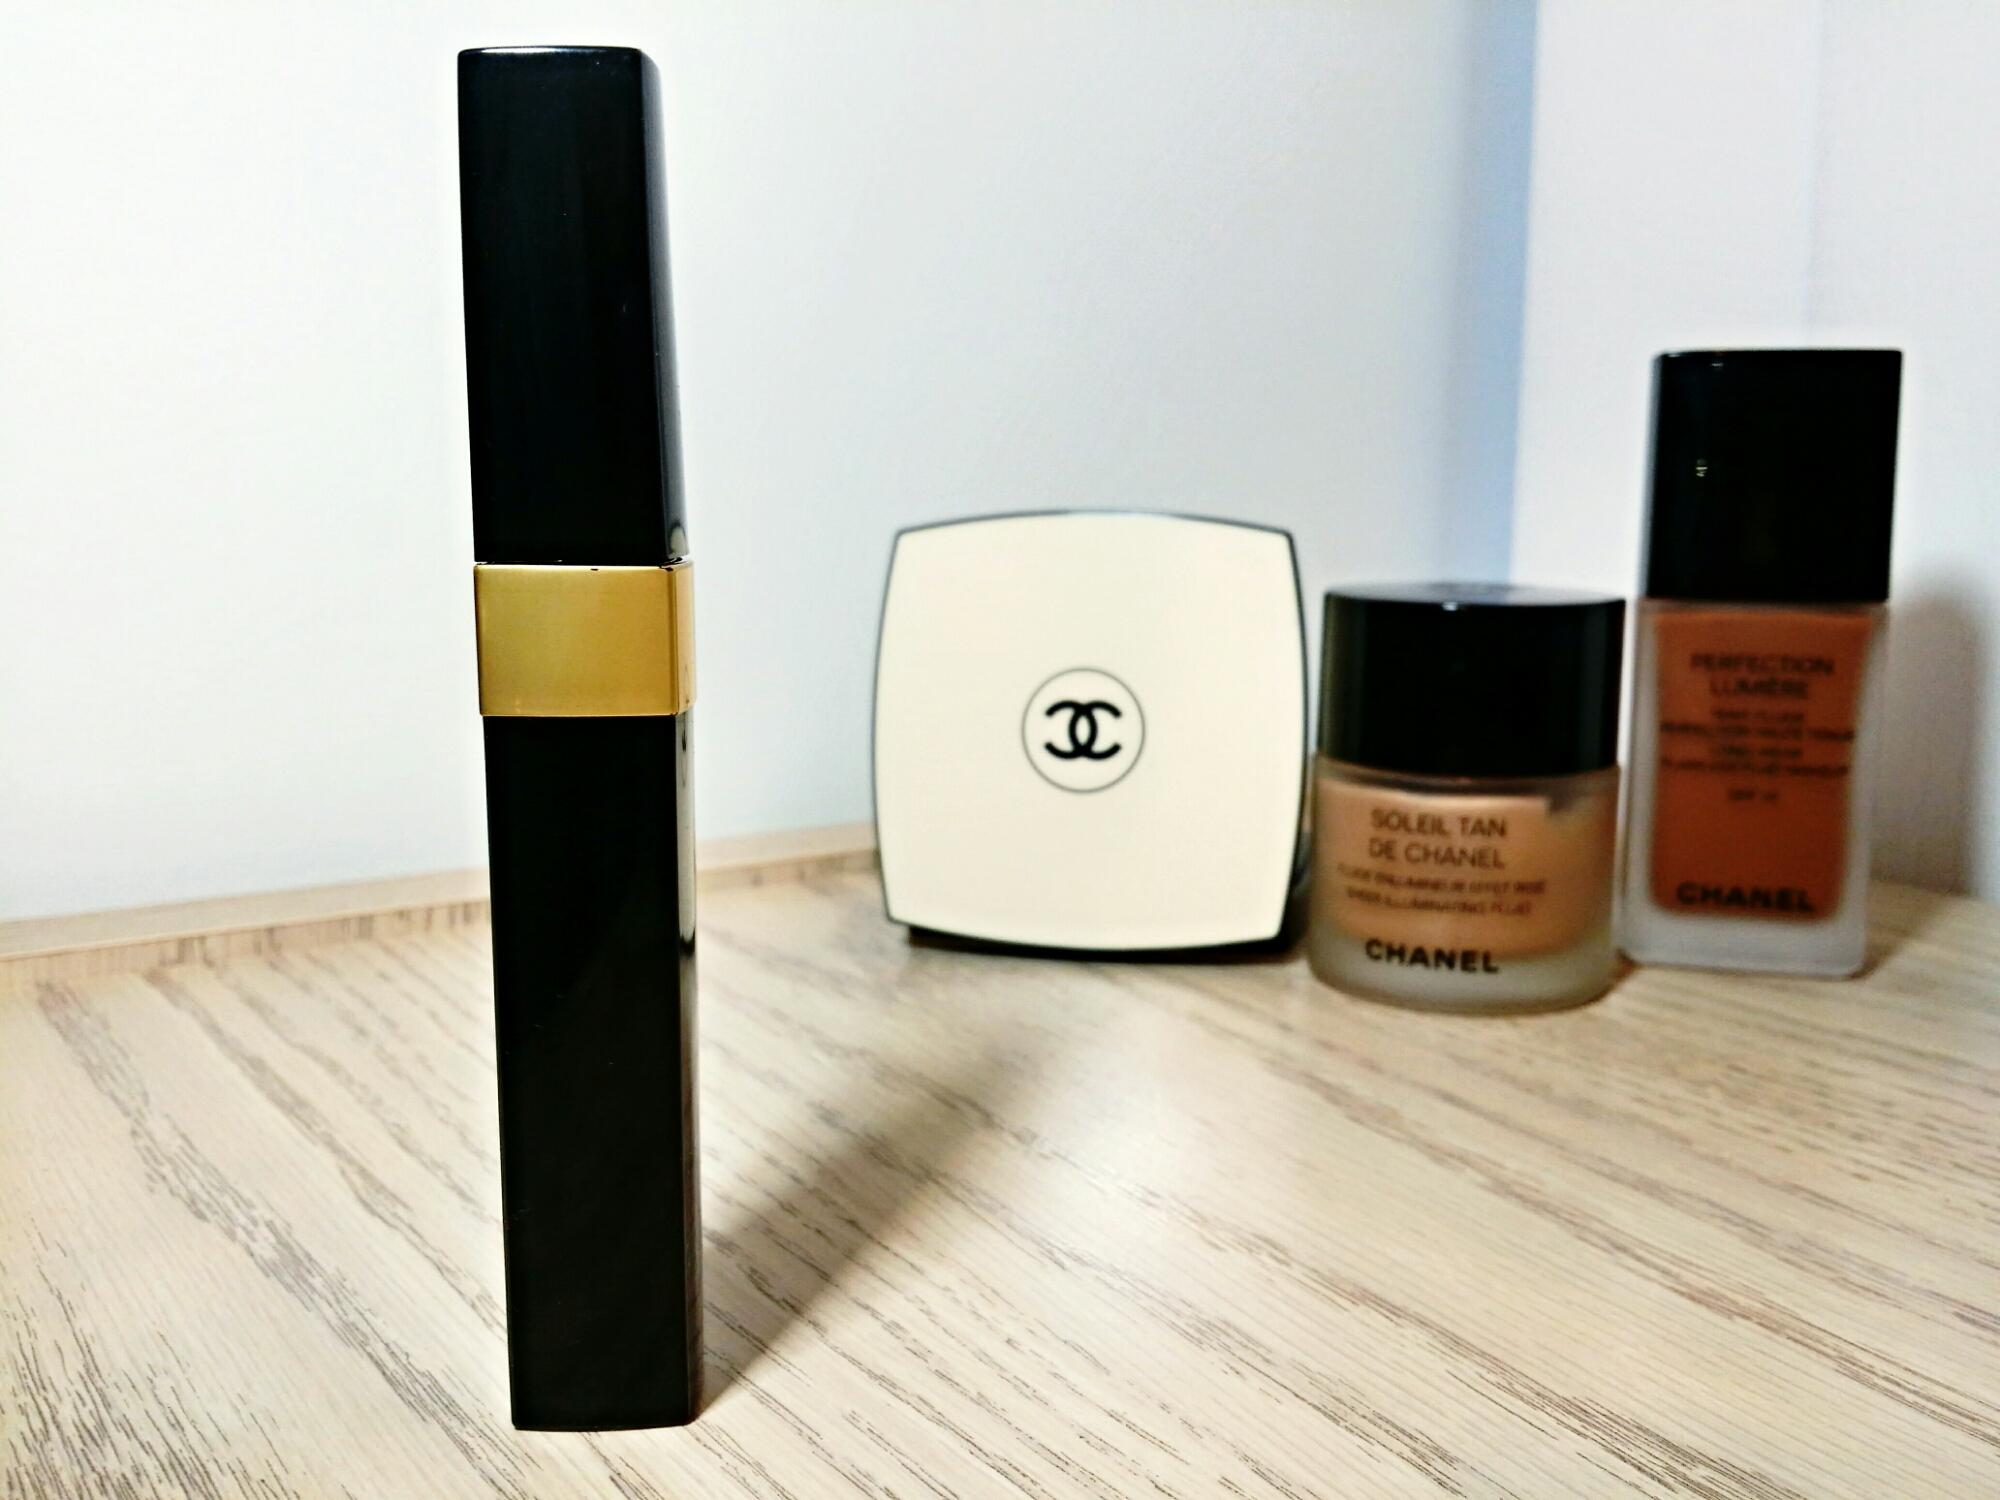 ff972d7e920 Chanel Inimitable Waterproof Mascara Review   Fancieland